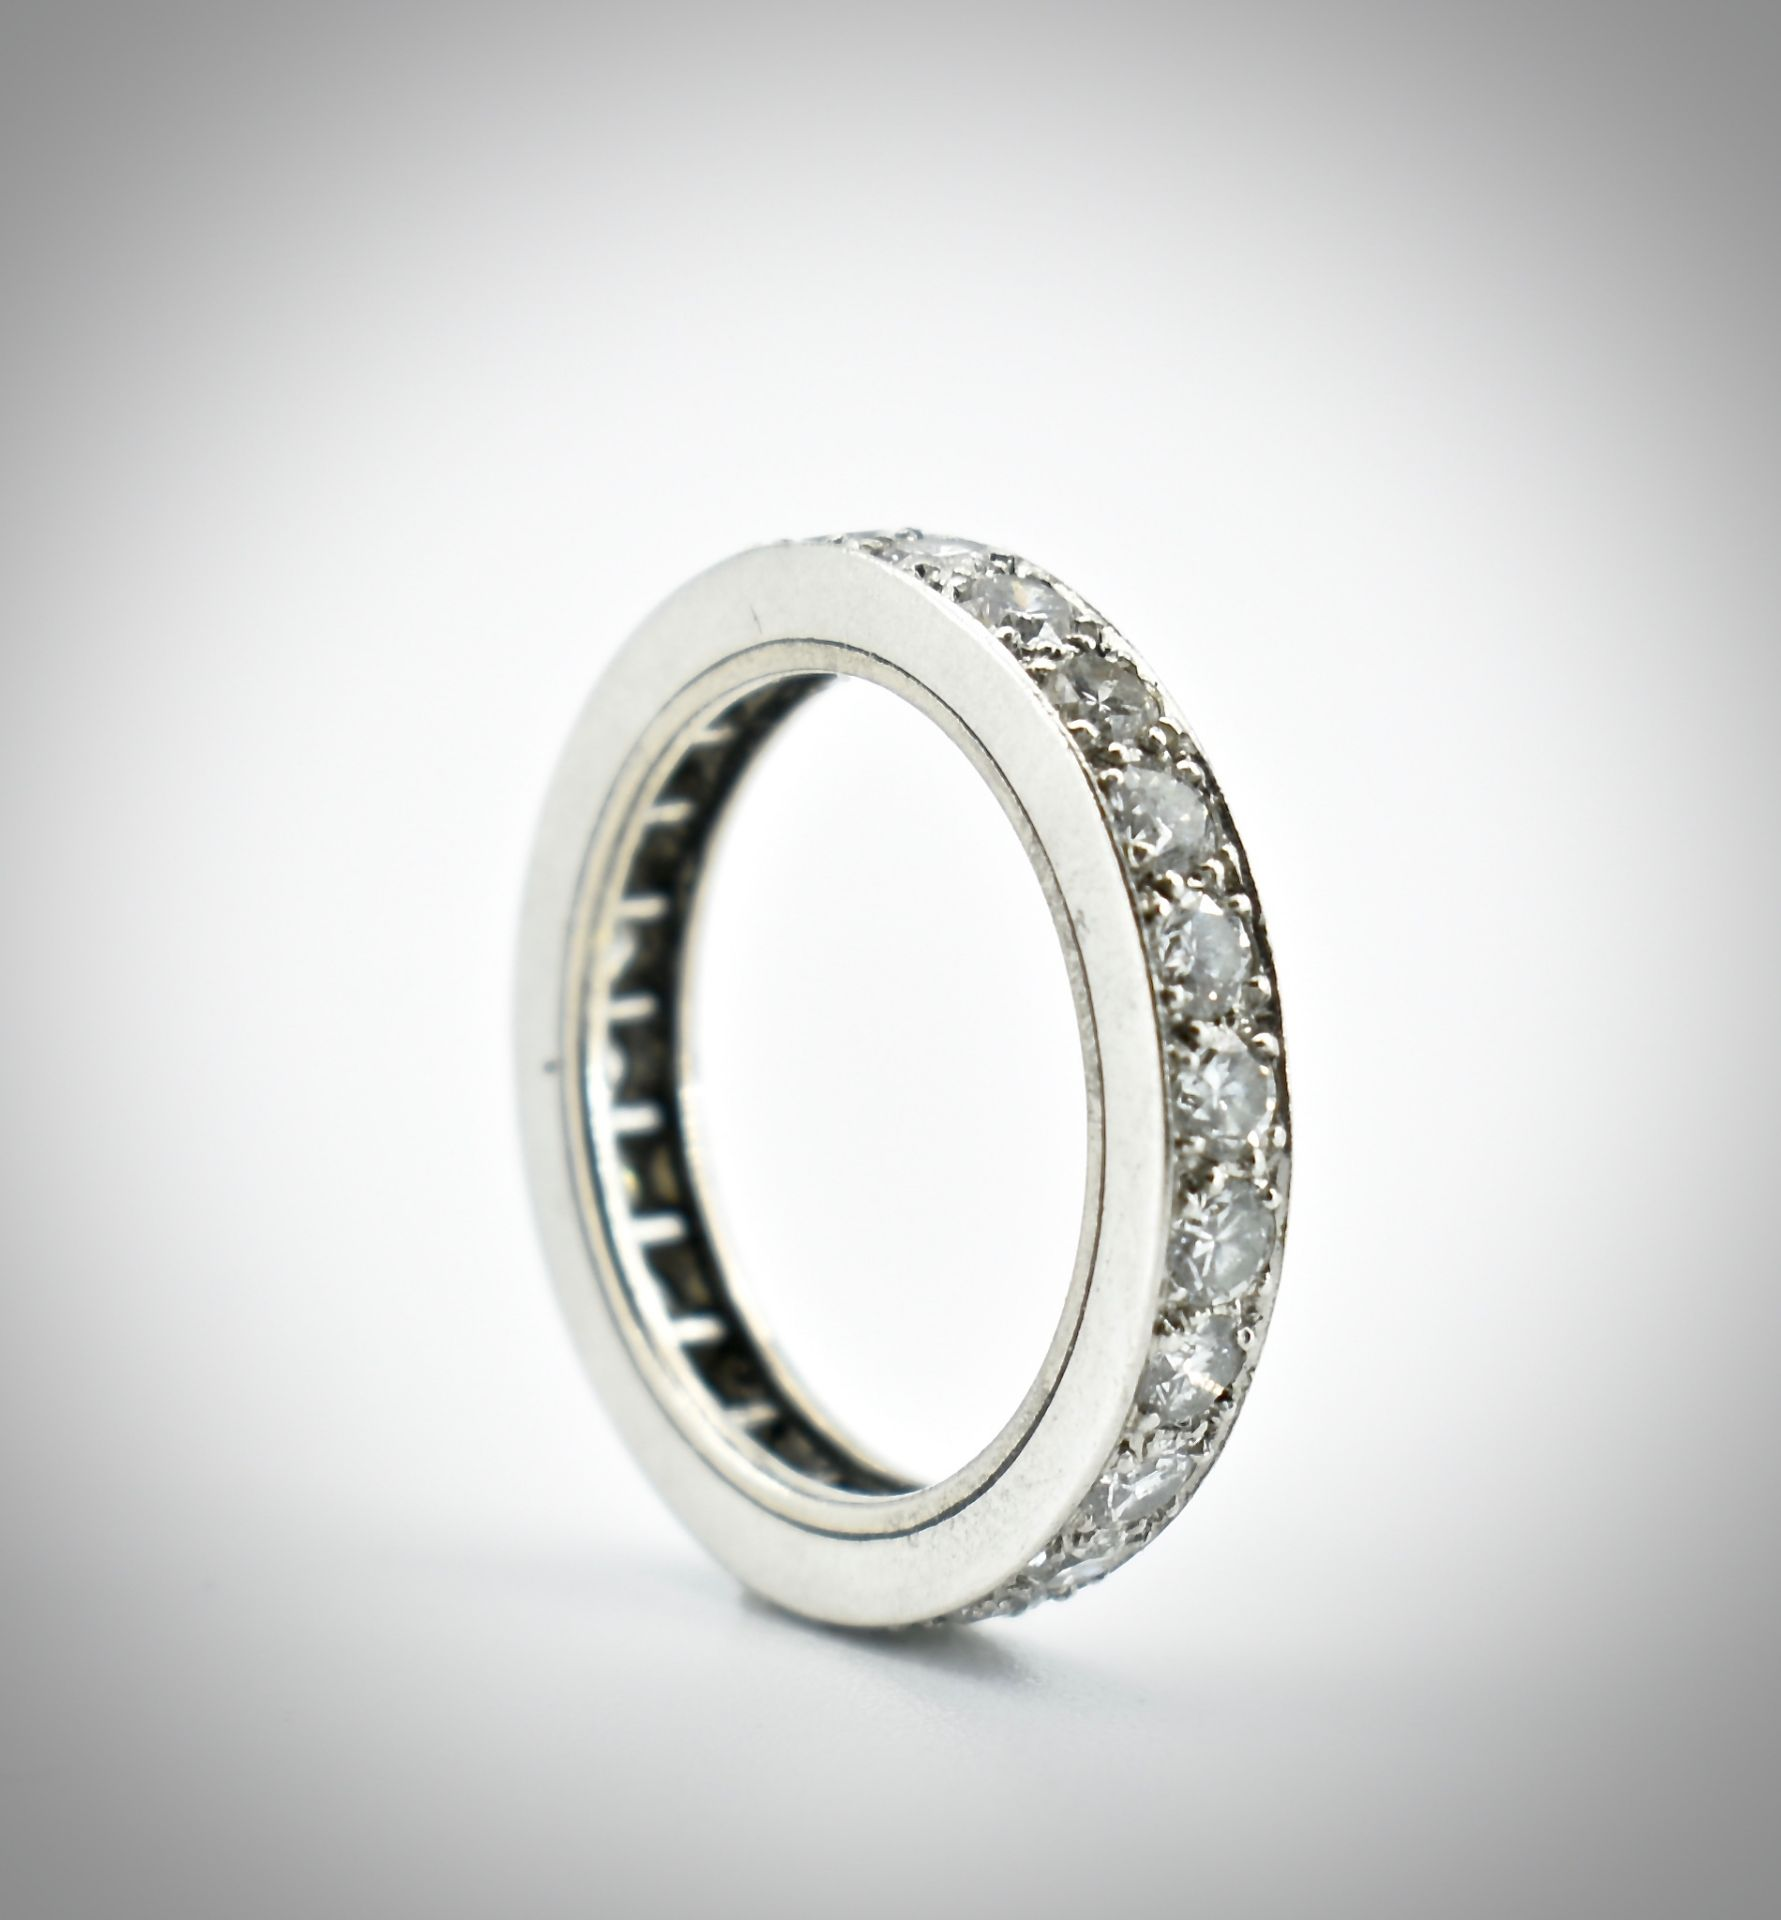 An 18ct Gold Platinum & Diamond Eternity Ring - Image 2 of 2